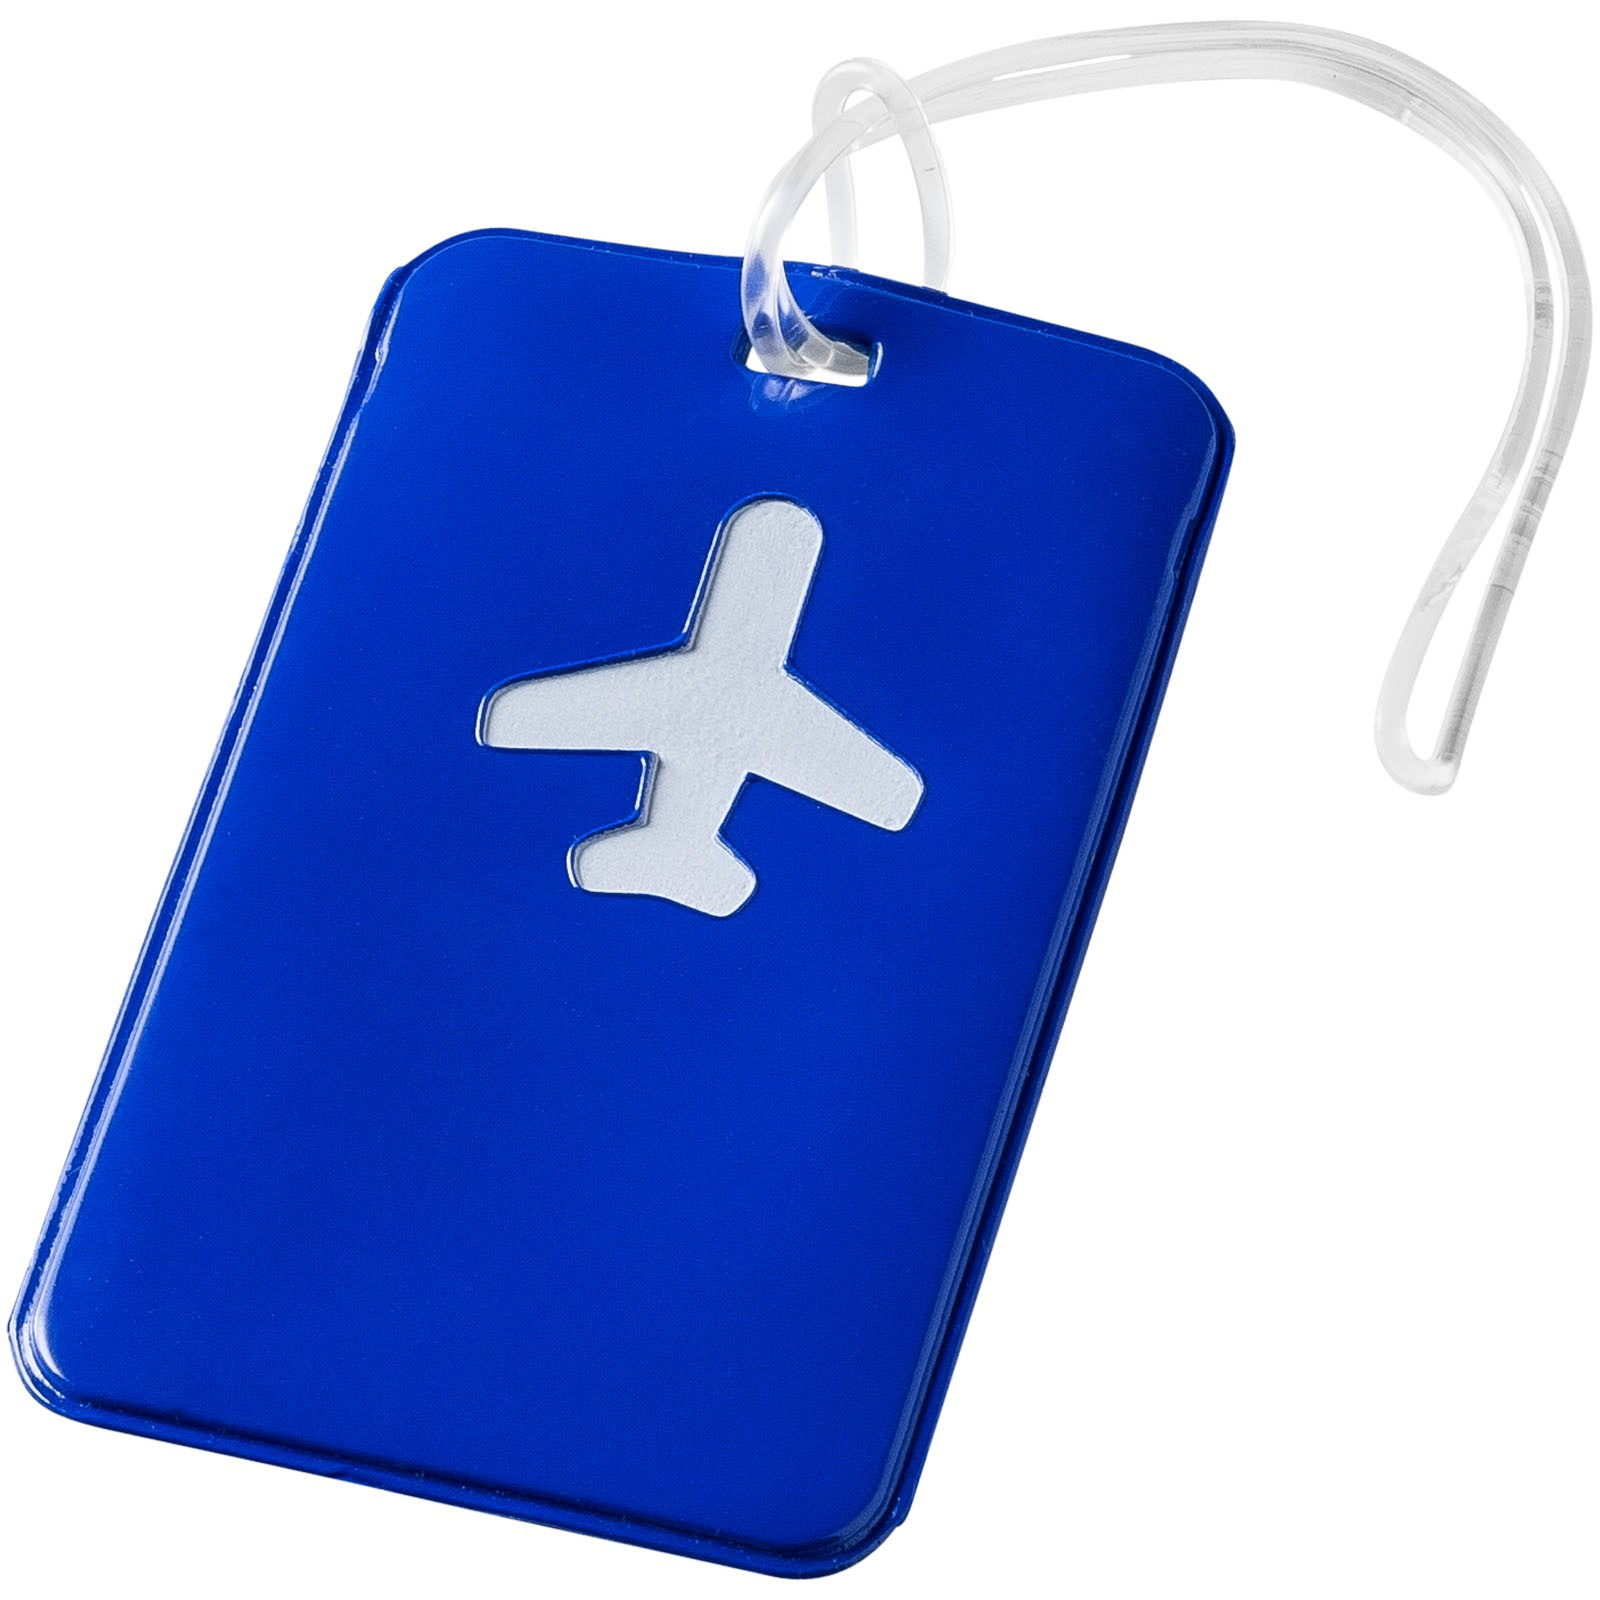 Voyage luggage tag - Blue